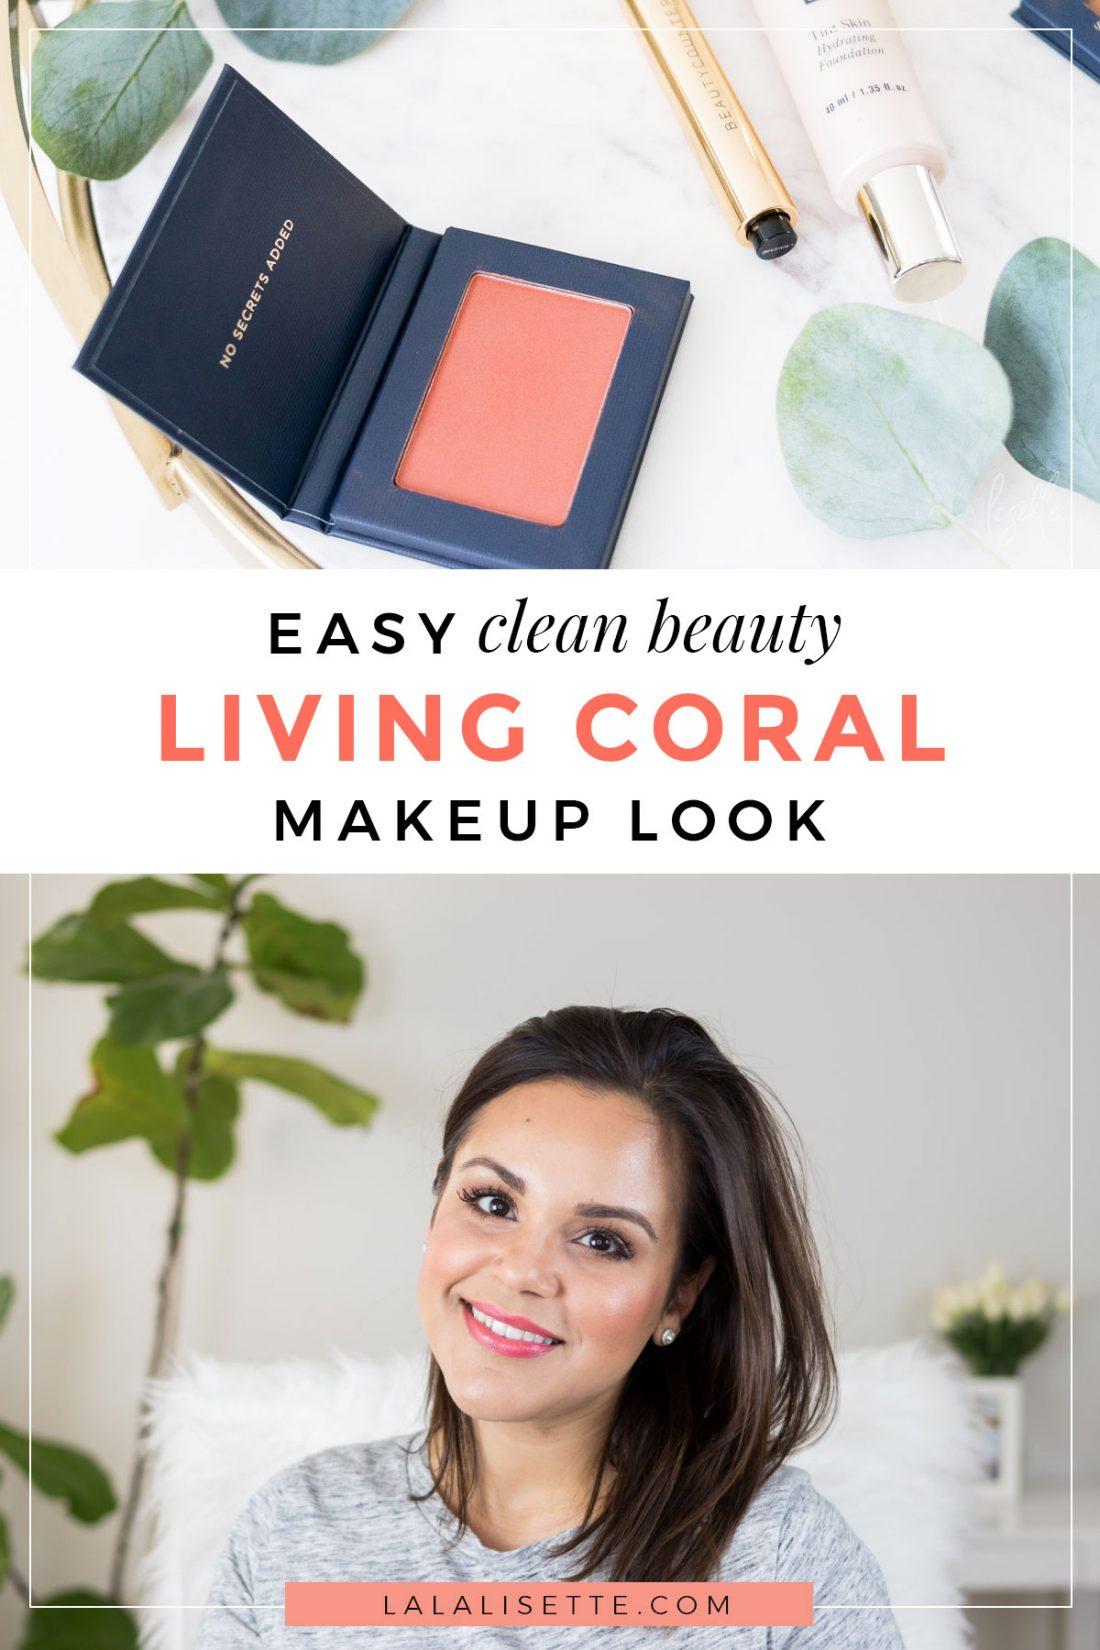 Easy Clean Beauty Living Coral Makeup #cleanbeauty #lalalisetteblog